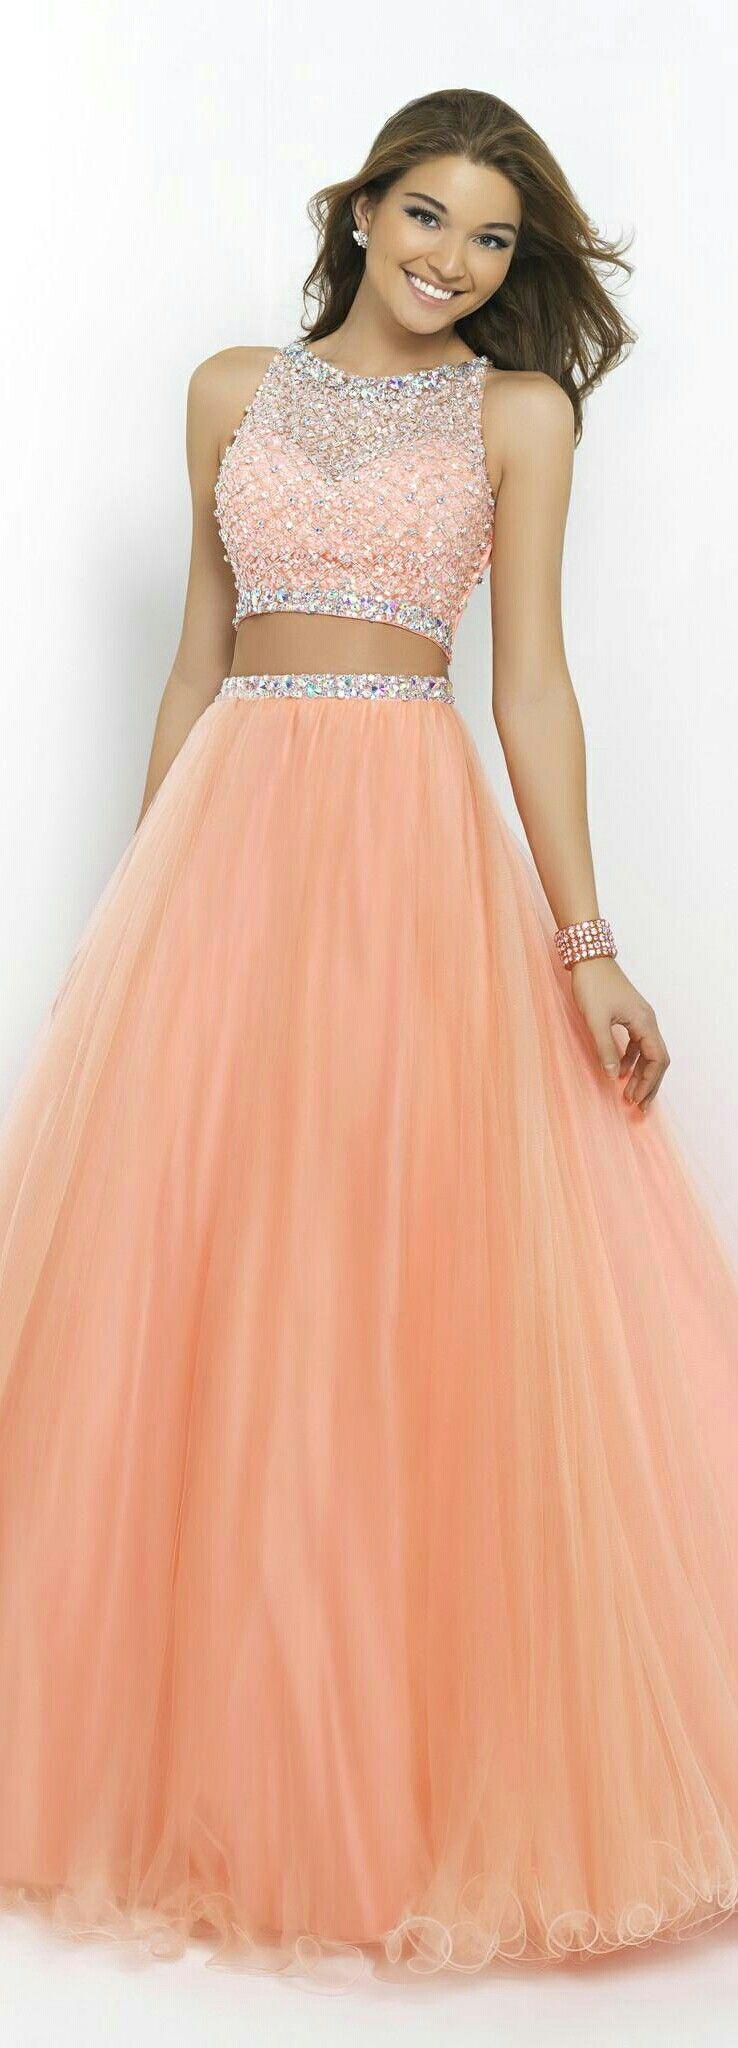 Women S 2 Piece Prom Gown In Light Apricot Www Lovingsdresses Com Cute Prom Dresses Piece Prom Dress Princess Prom Dresses [ 2048 x 738 Pixel ]